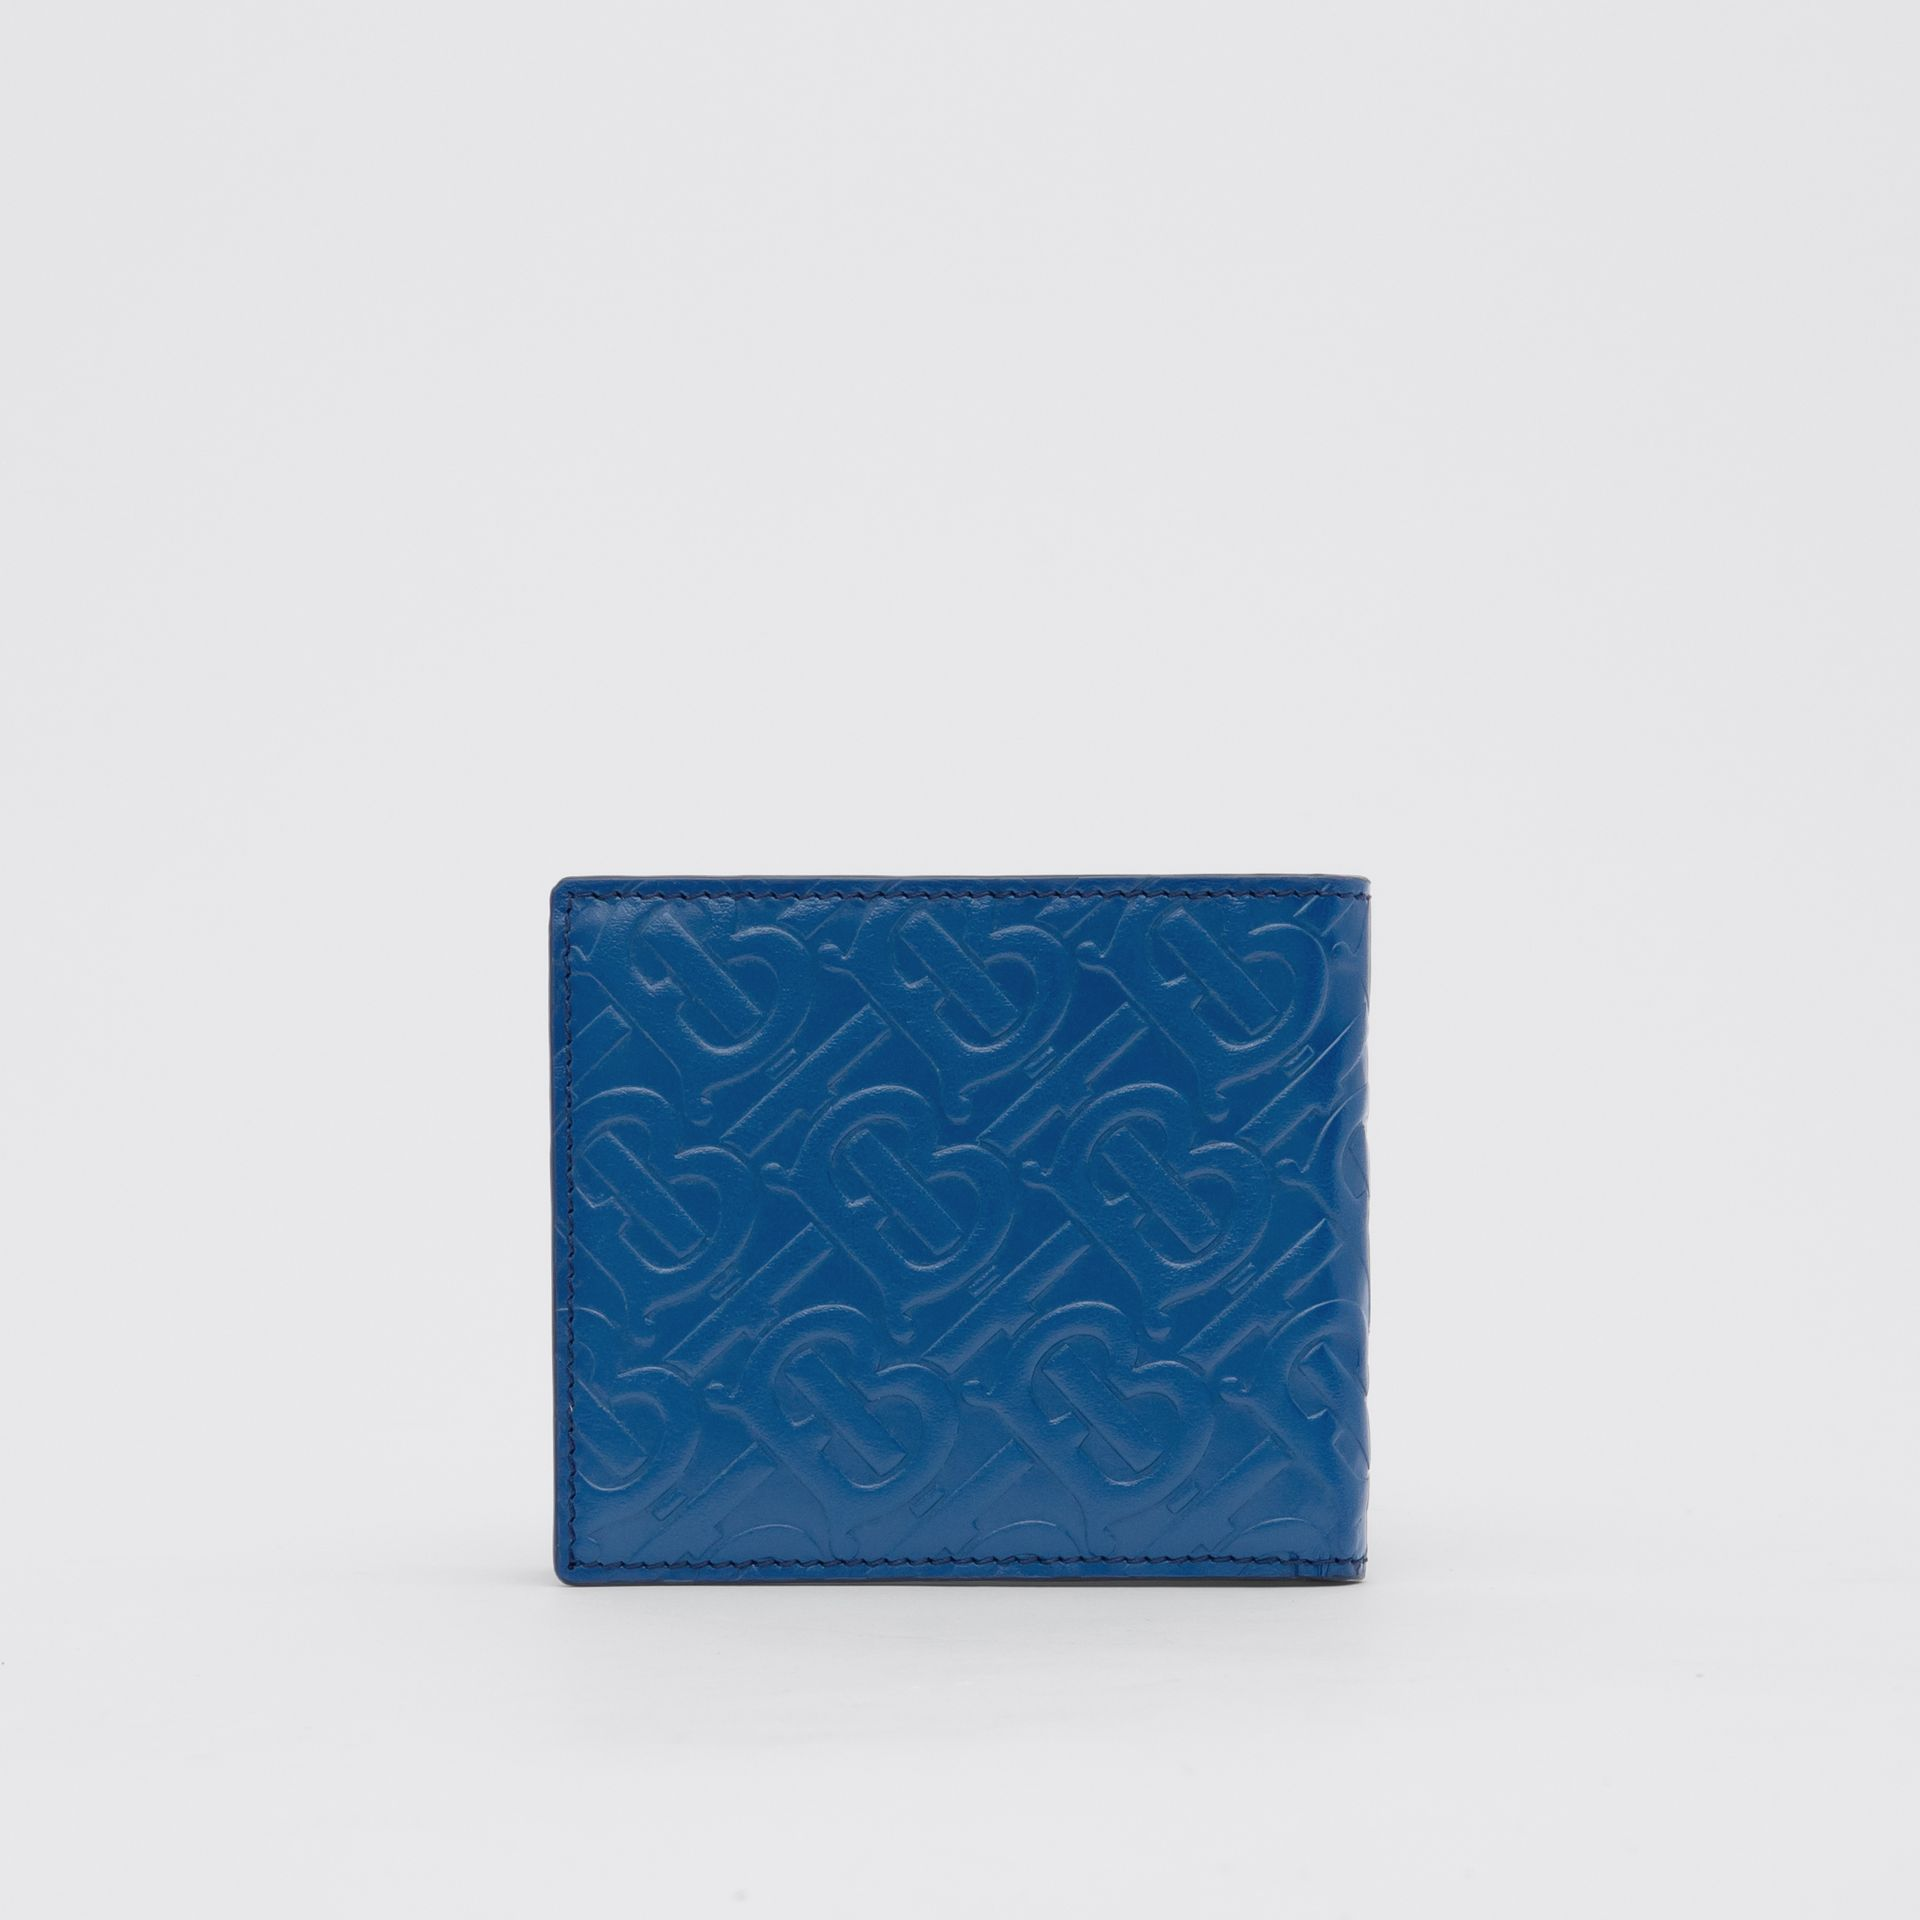 Monogram Leather International Bifold Wallet in Pale Canvas Blue - Men   Burberry - gallery image 4